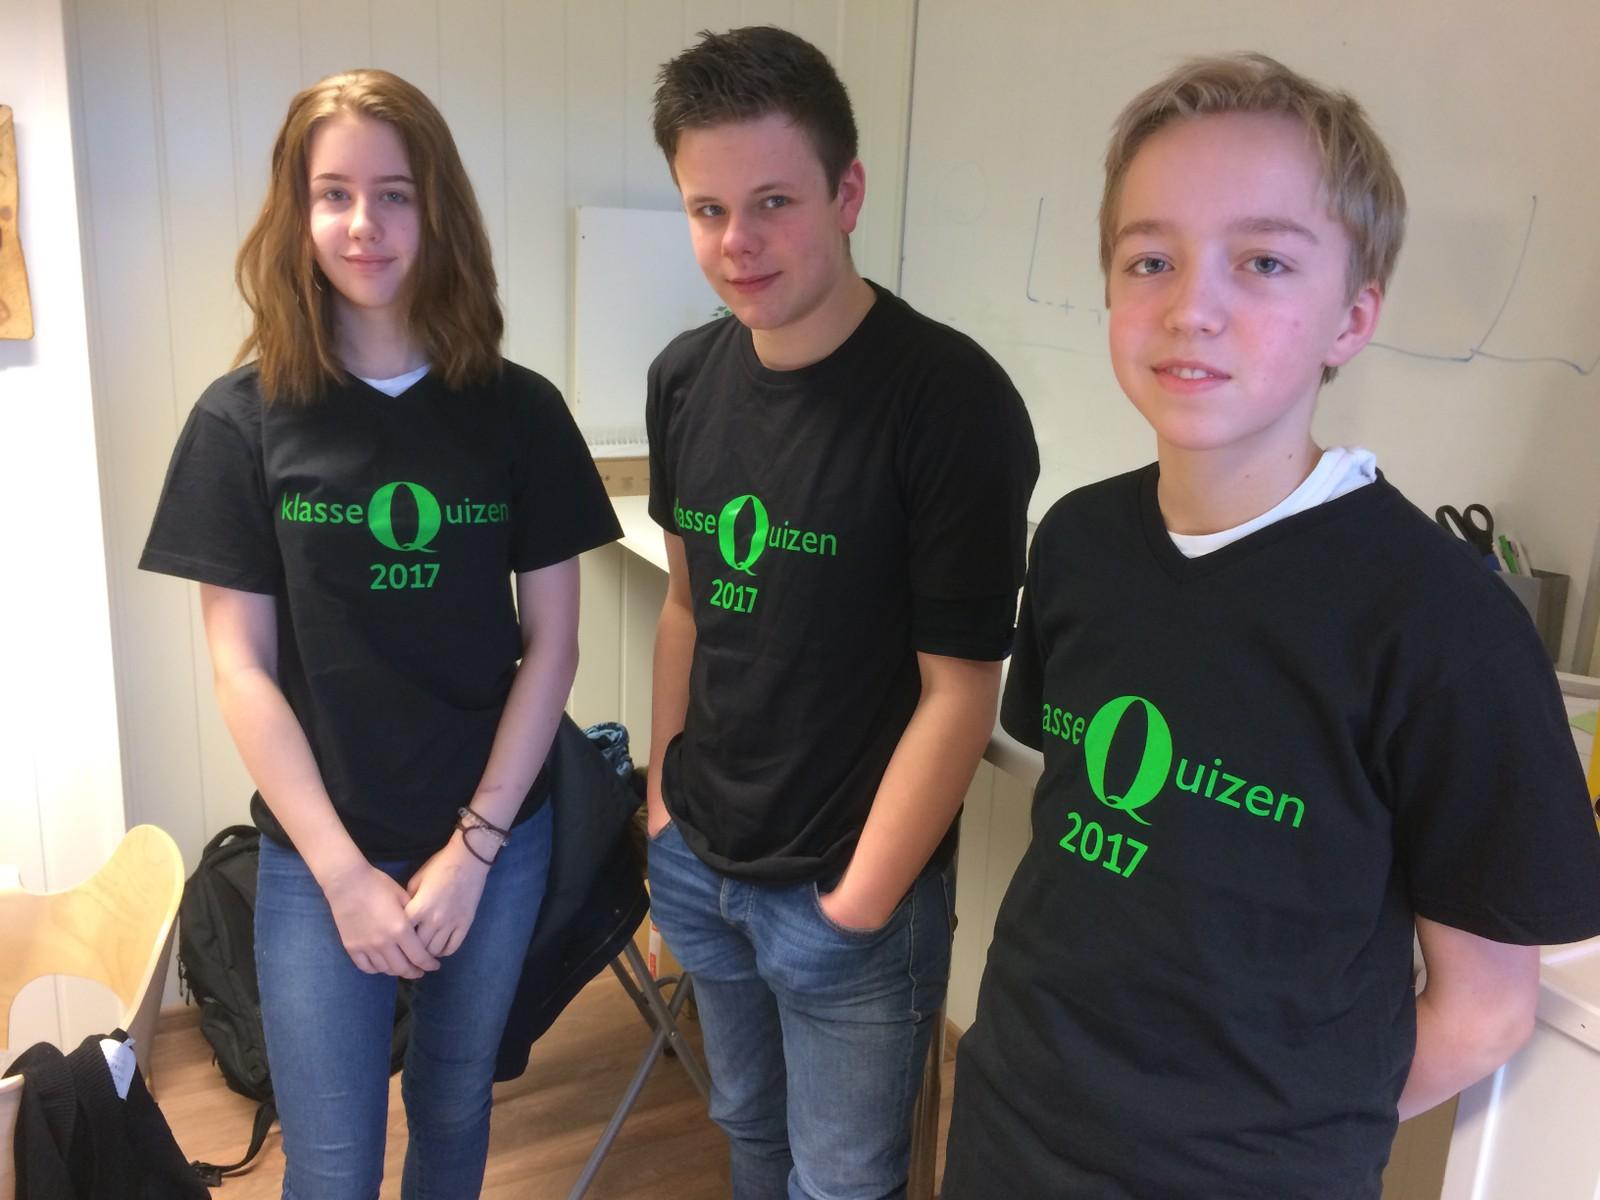 FAGERHAUG KRISTNE SKOLE: Elise Grytdal, Stig Olav Walstad og Andreas Grimstad.